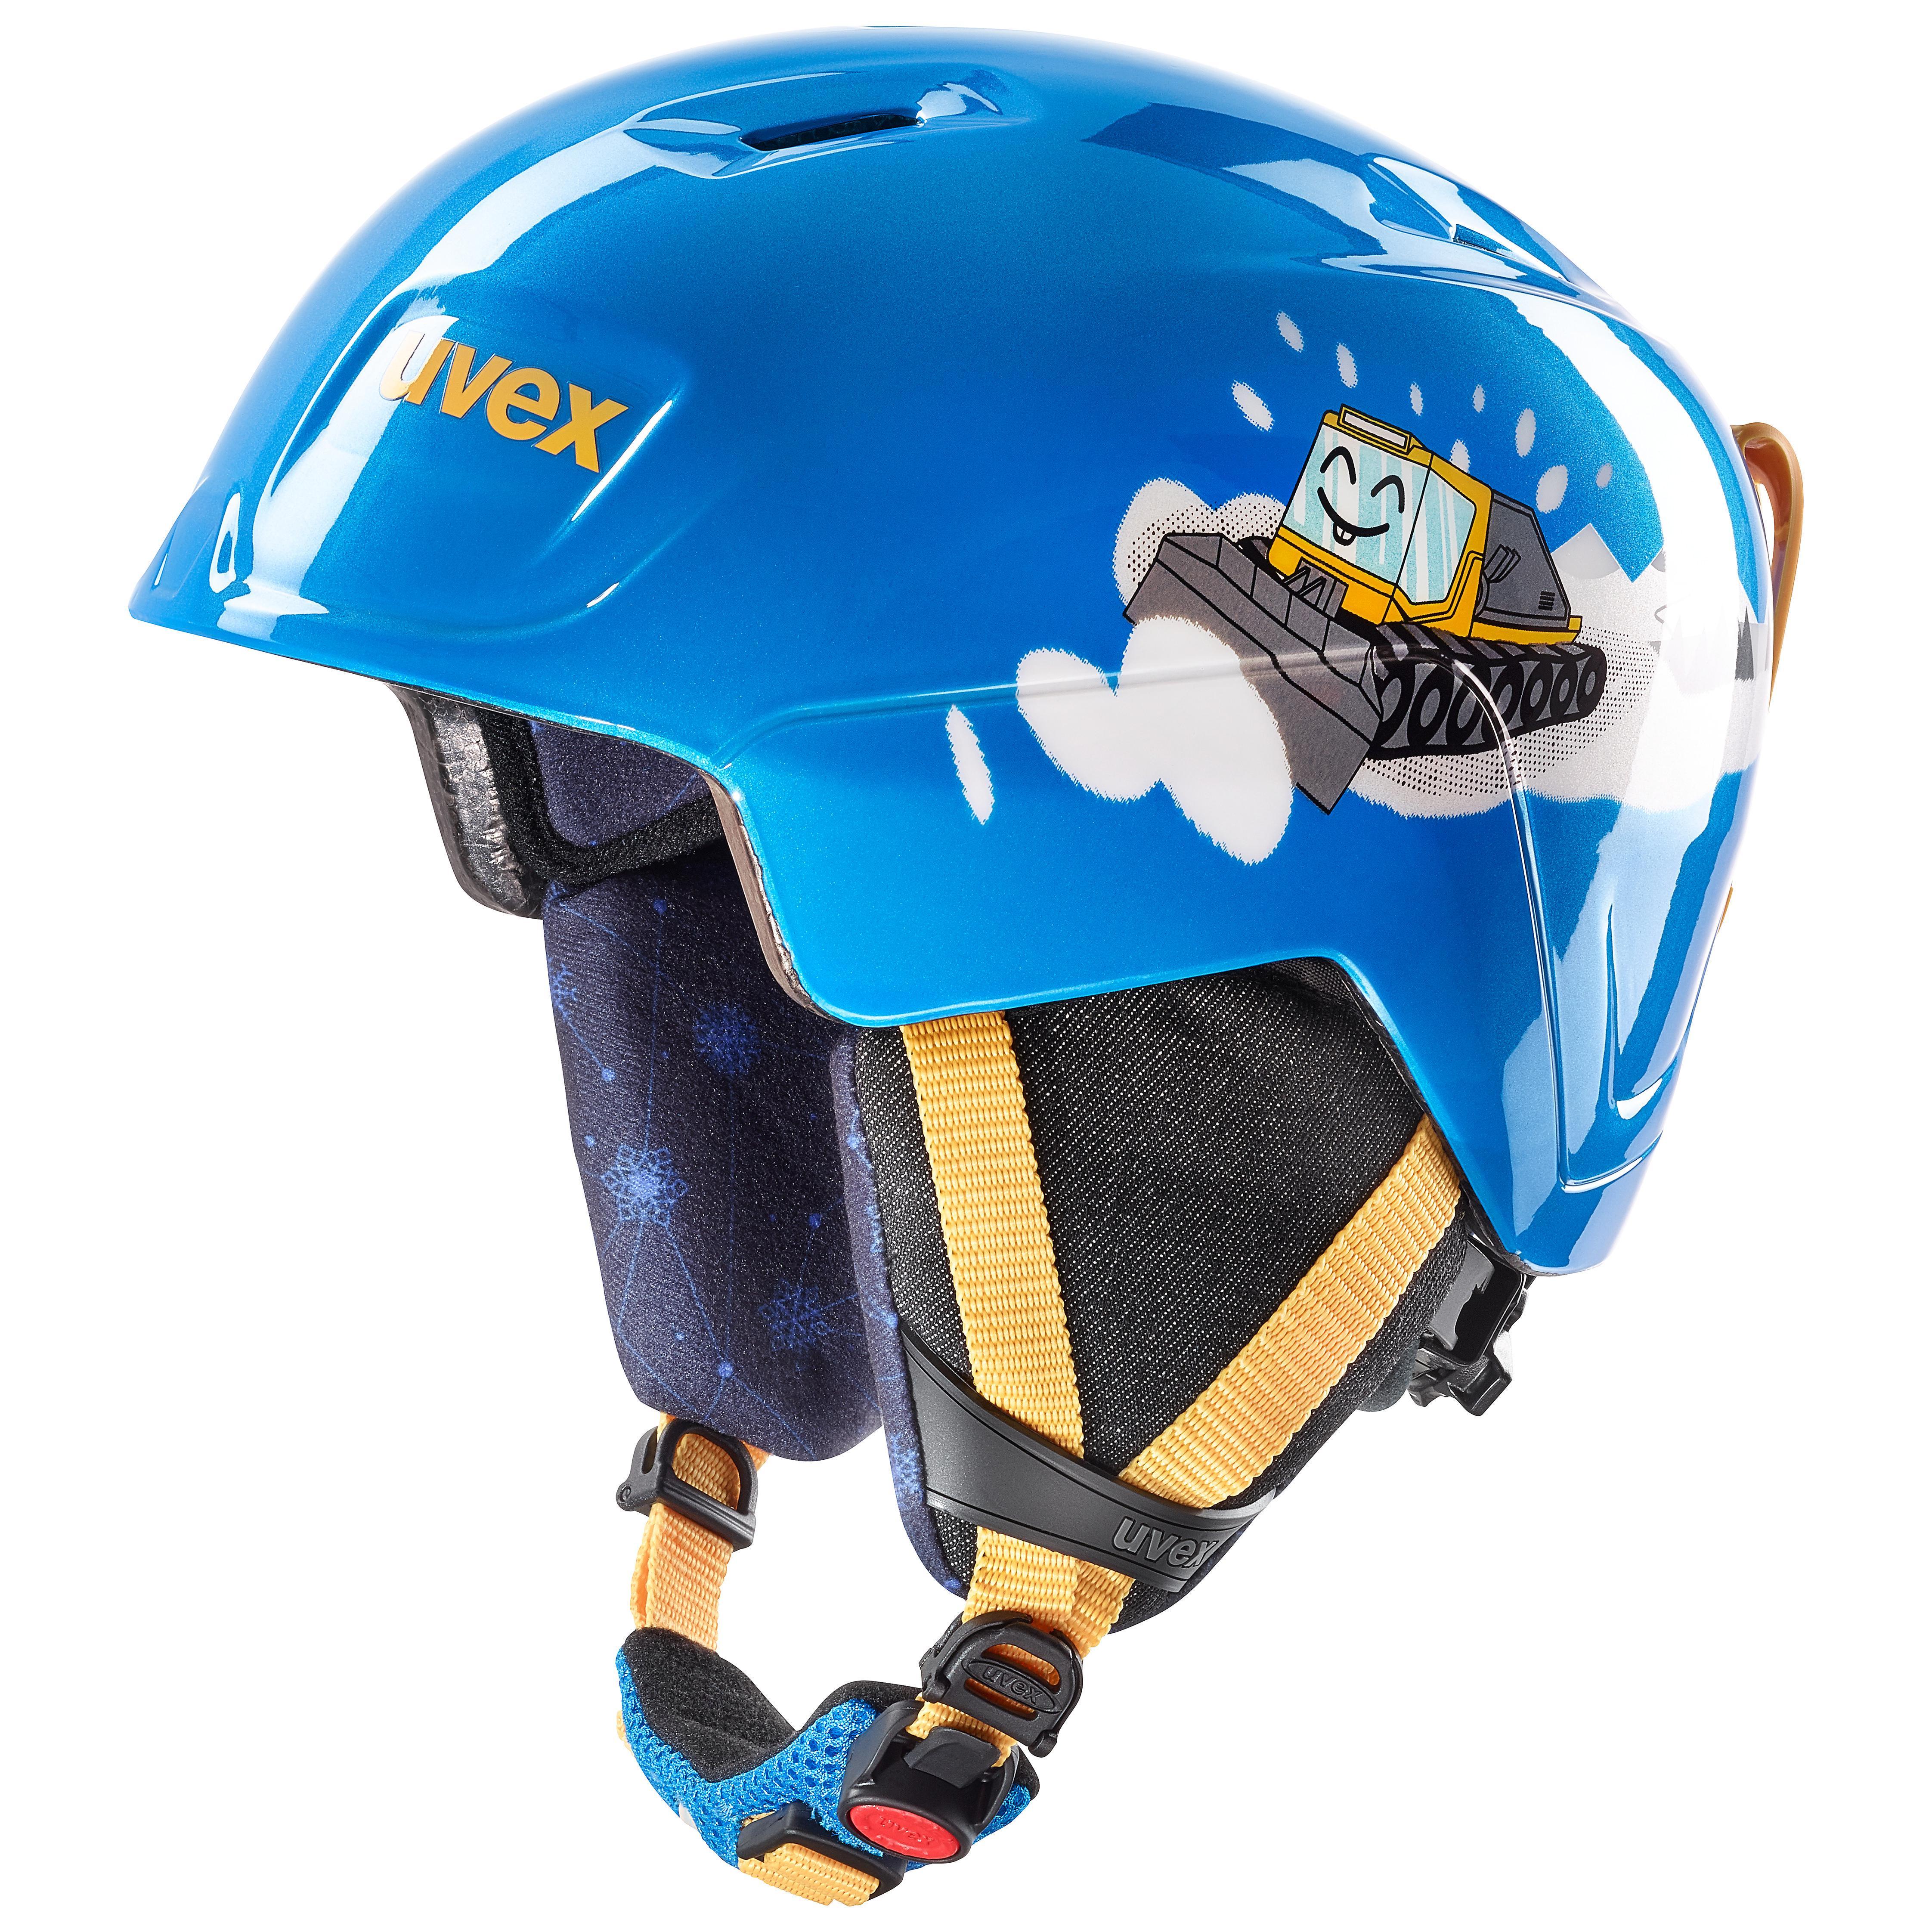 helma UVEX MANIC, blue caterpillar (S566226410*) 46-51